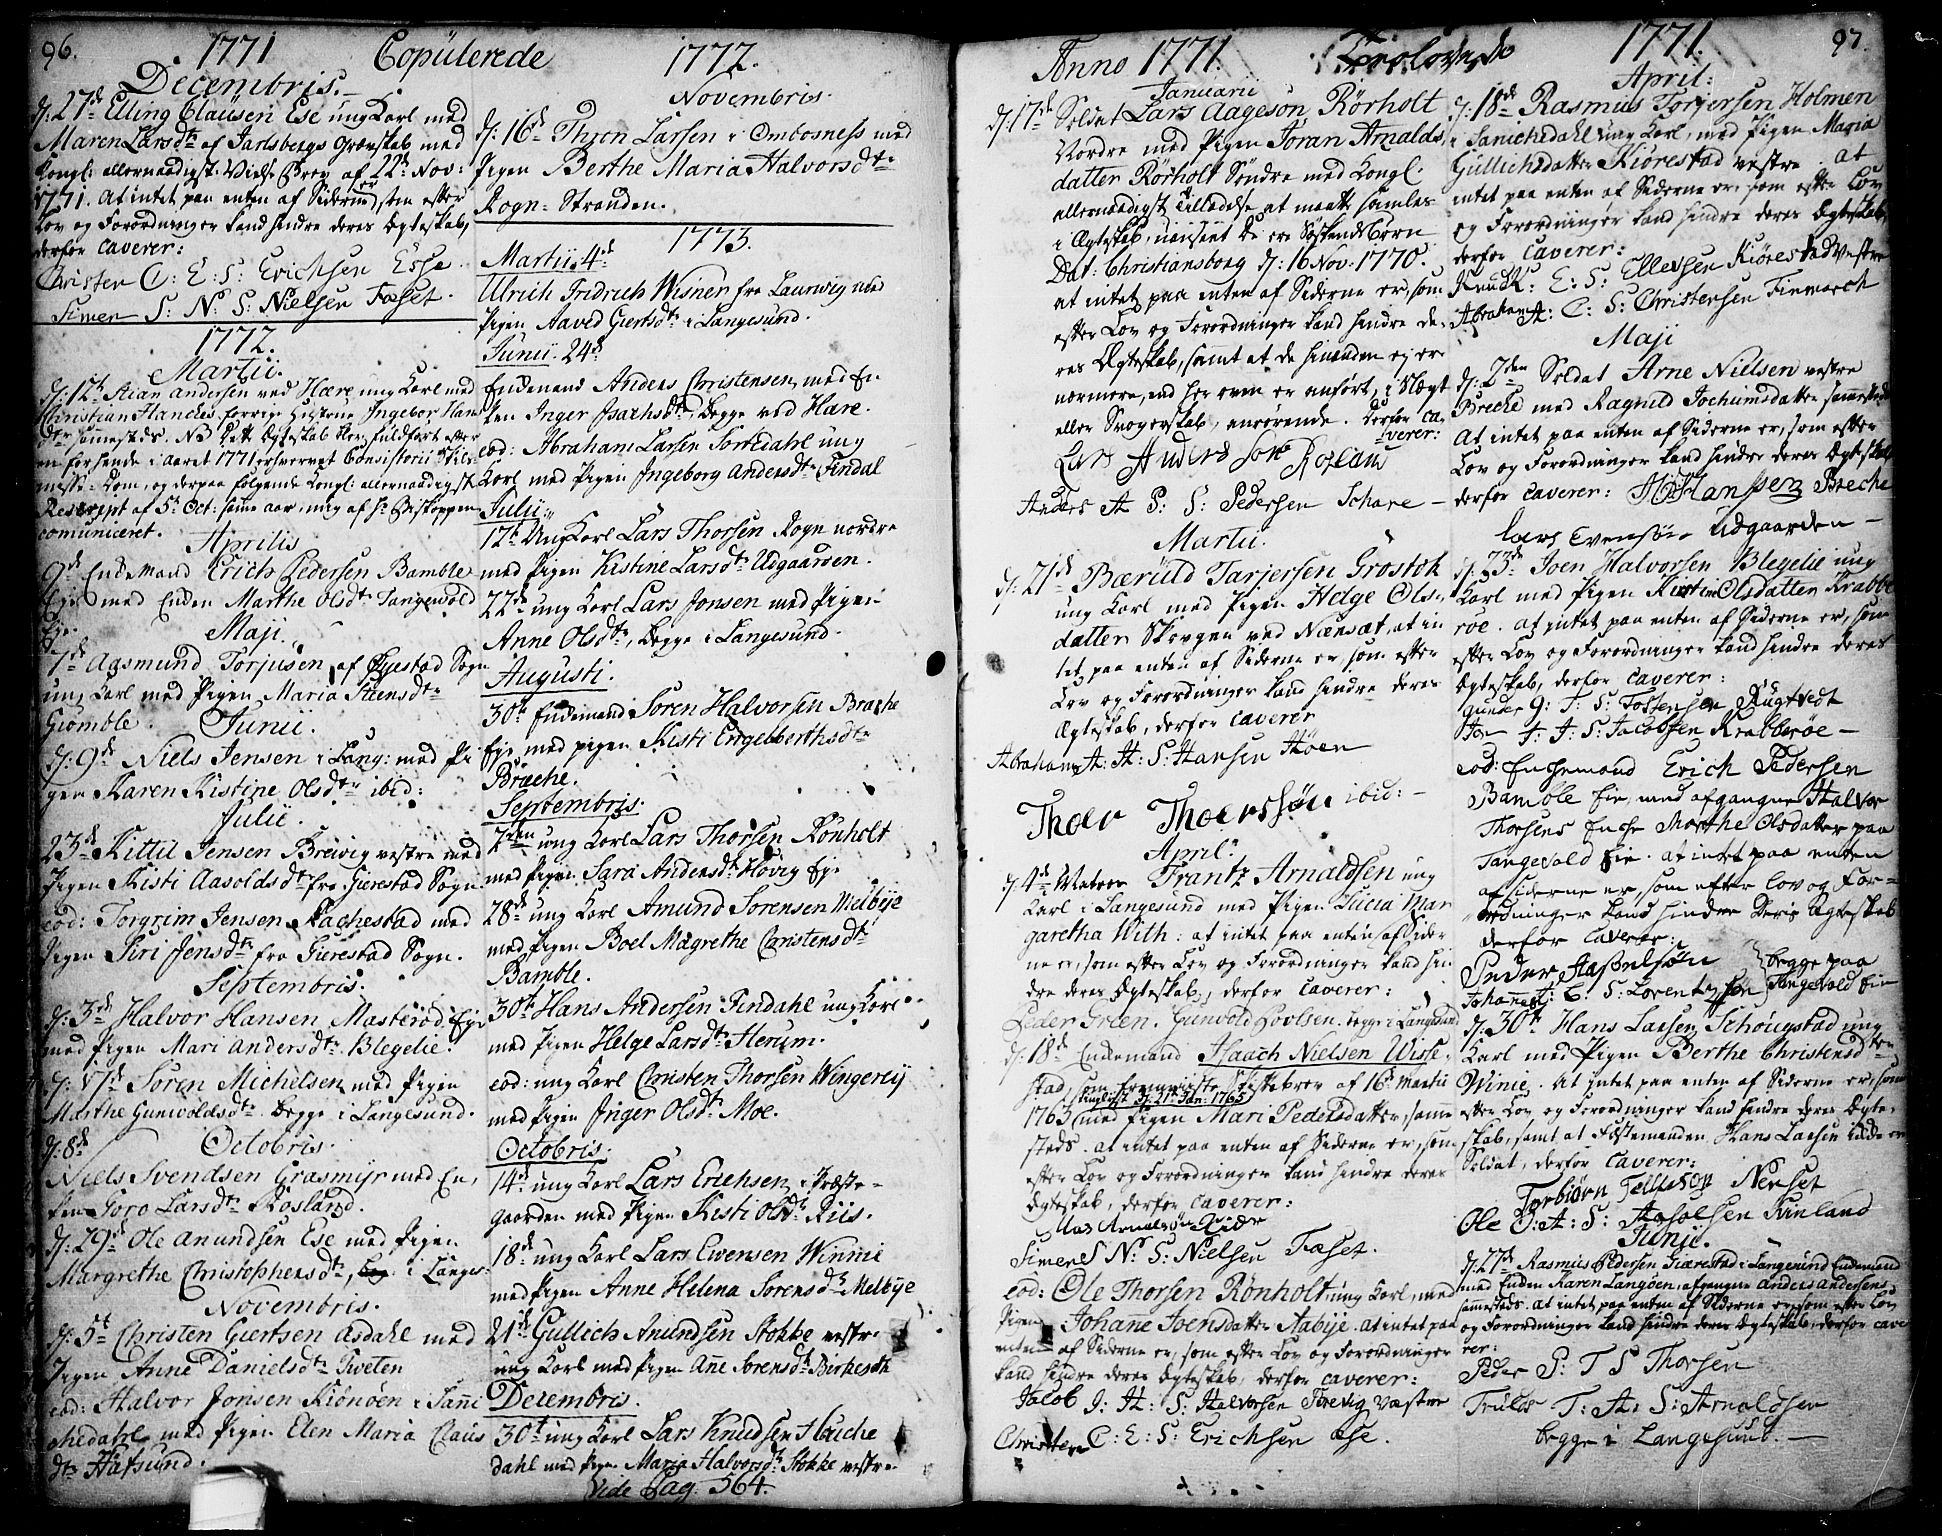 SAKO, Bamble kirkebøker, F/Fa/L0001: Ministerialbok nr. I 1, 1702-1774, s. 96-97